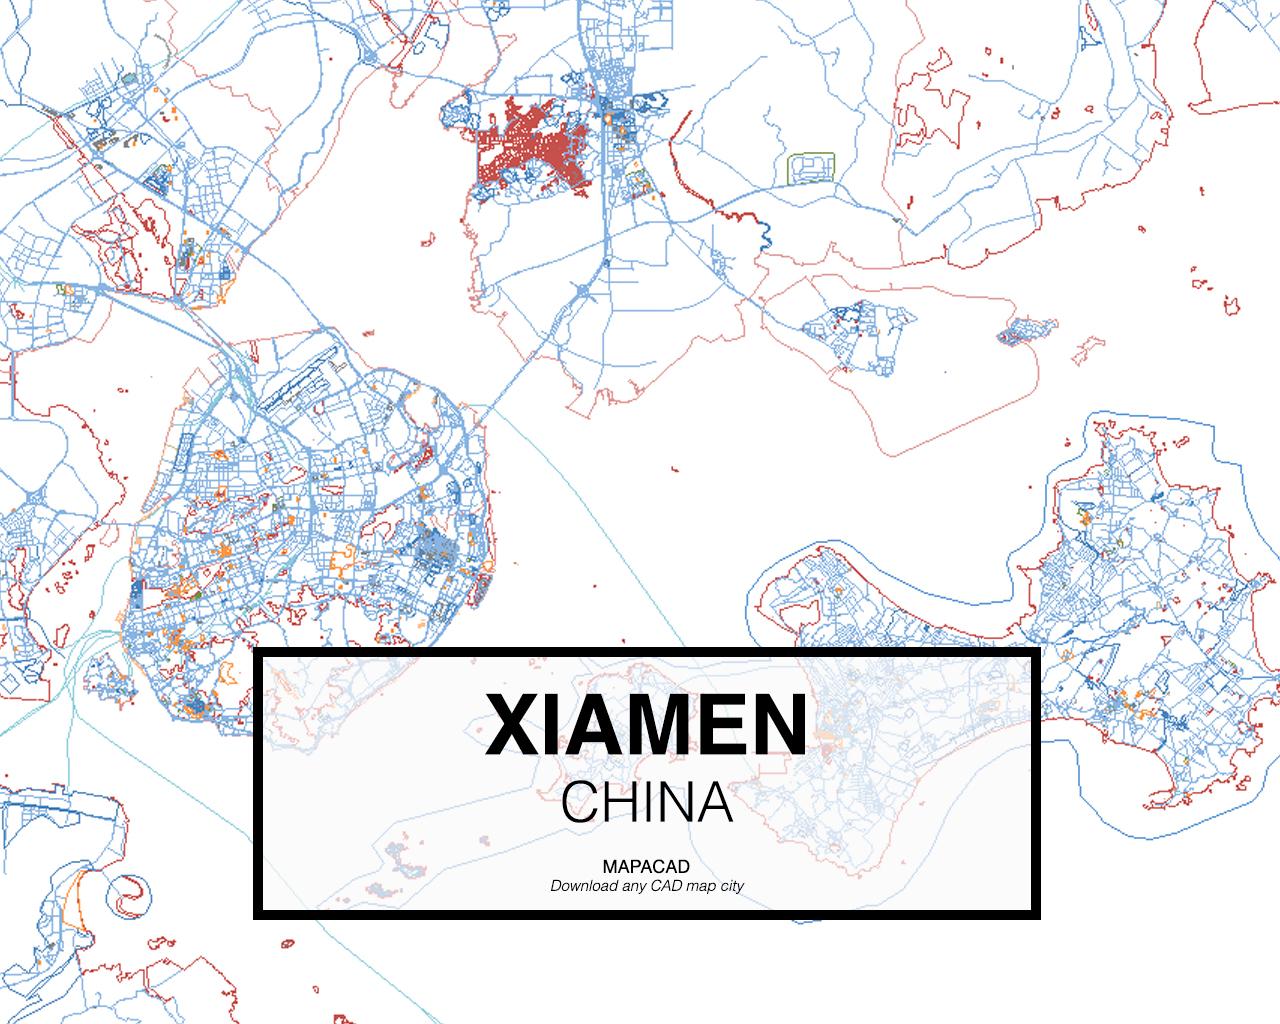 Download xiamen dwg mapacad xiamen china 01 mapacad download map cad dwg gumiabroncs Gallery